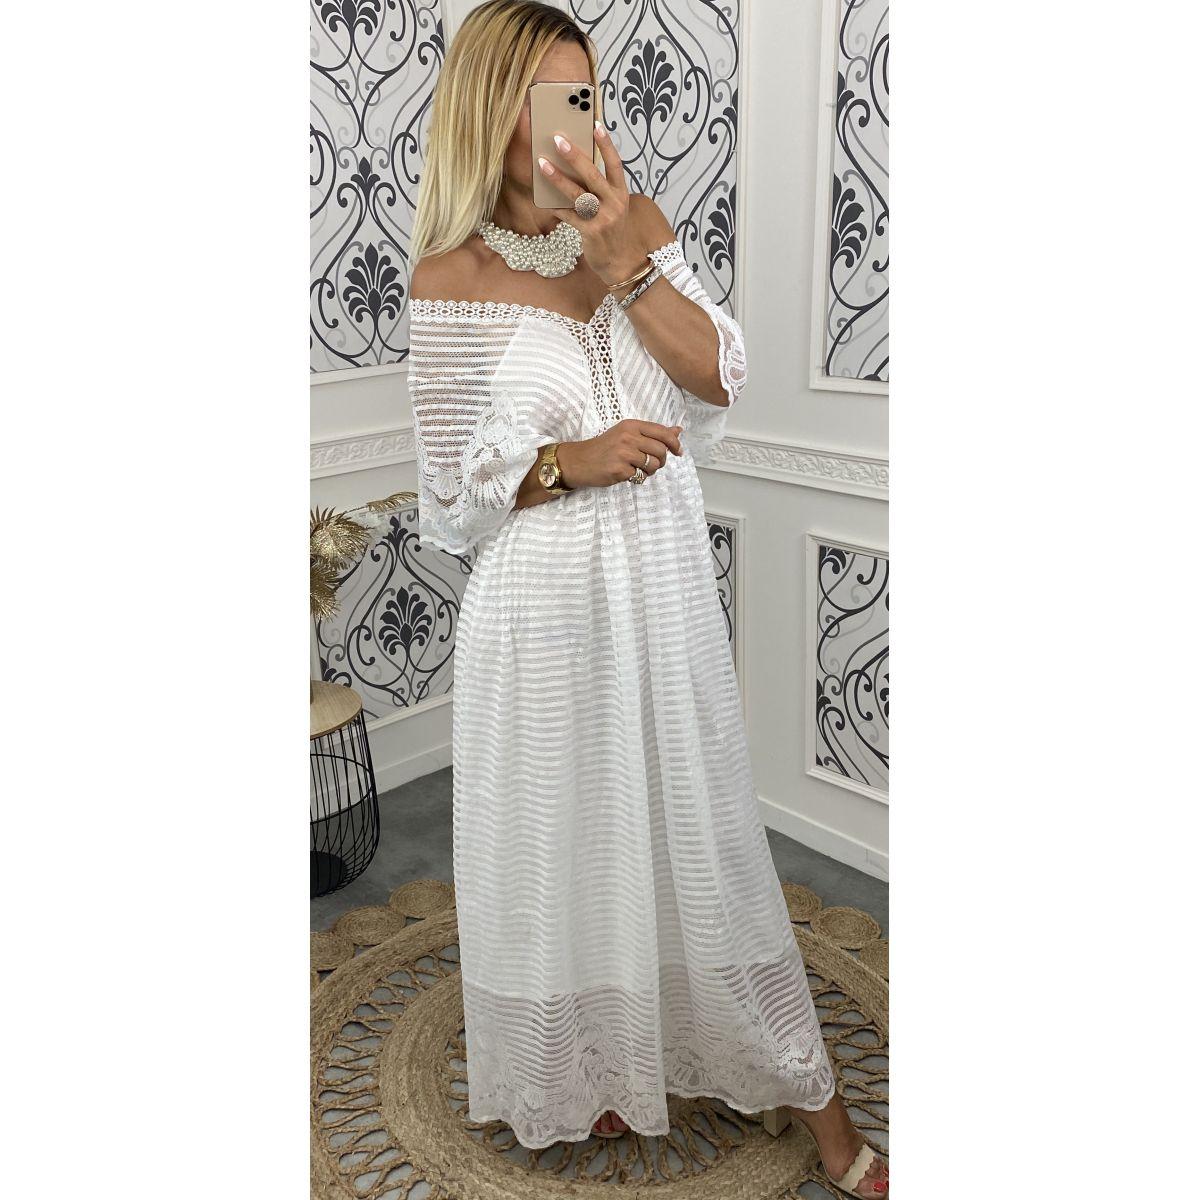 Robe en dentelle blanche manches courtes élargies